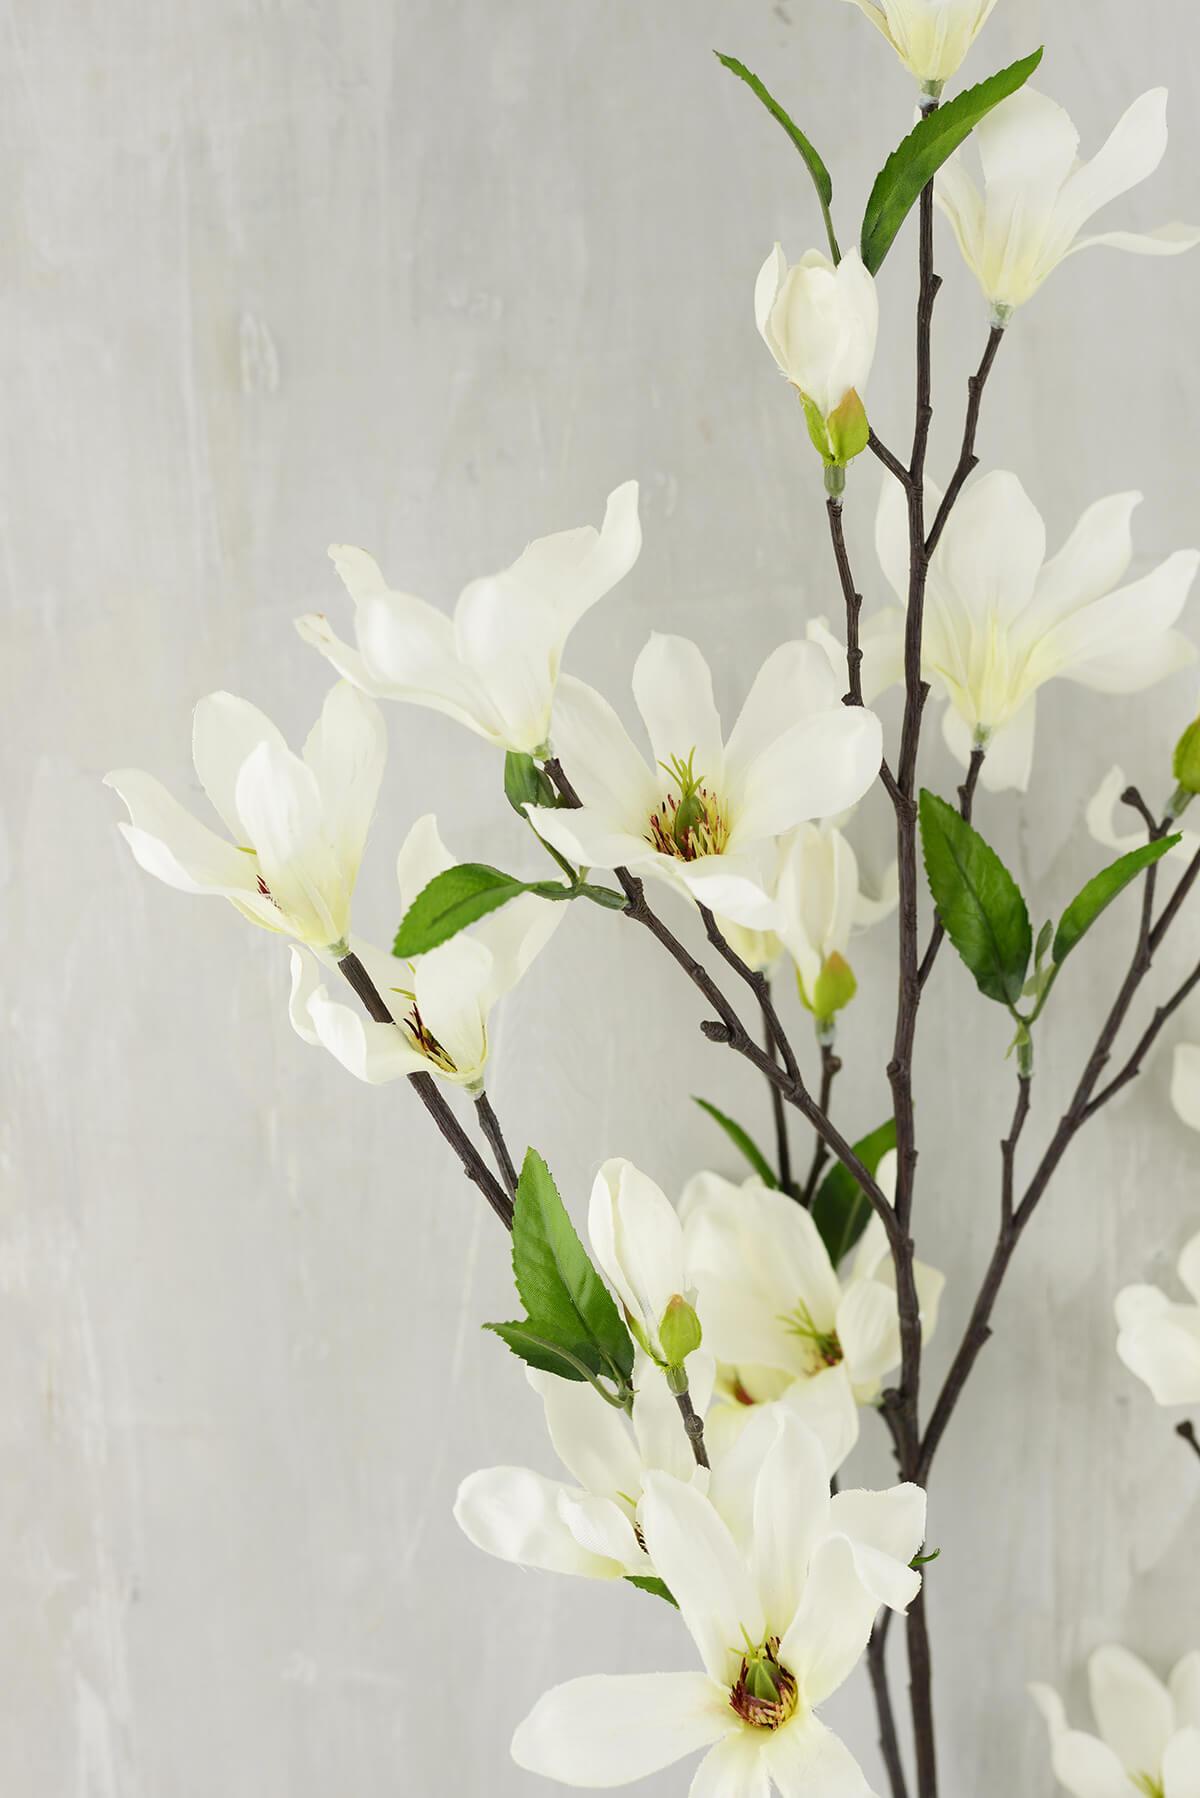 Flowering Branches Cream Flowers 44